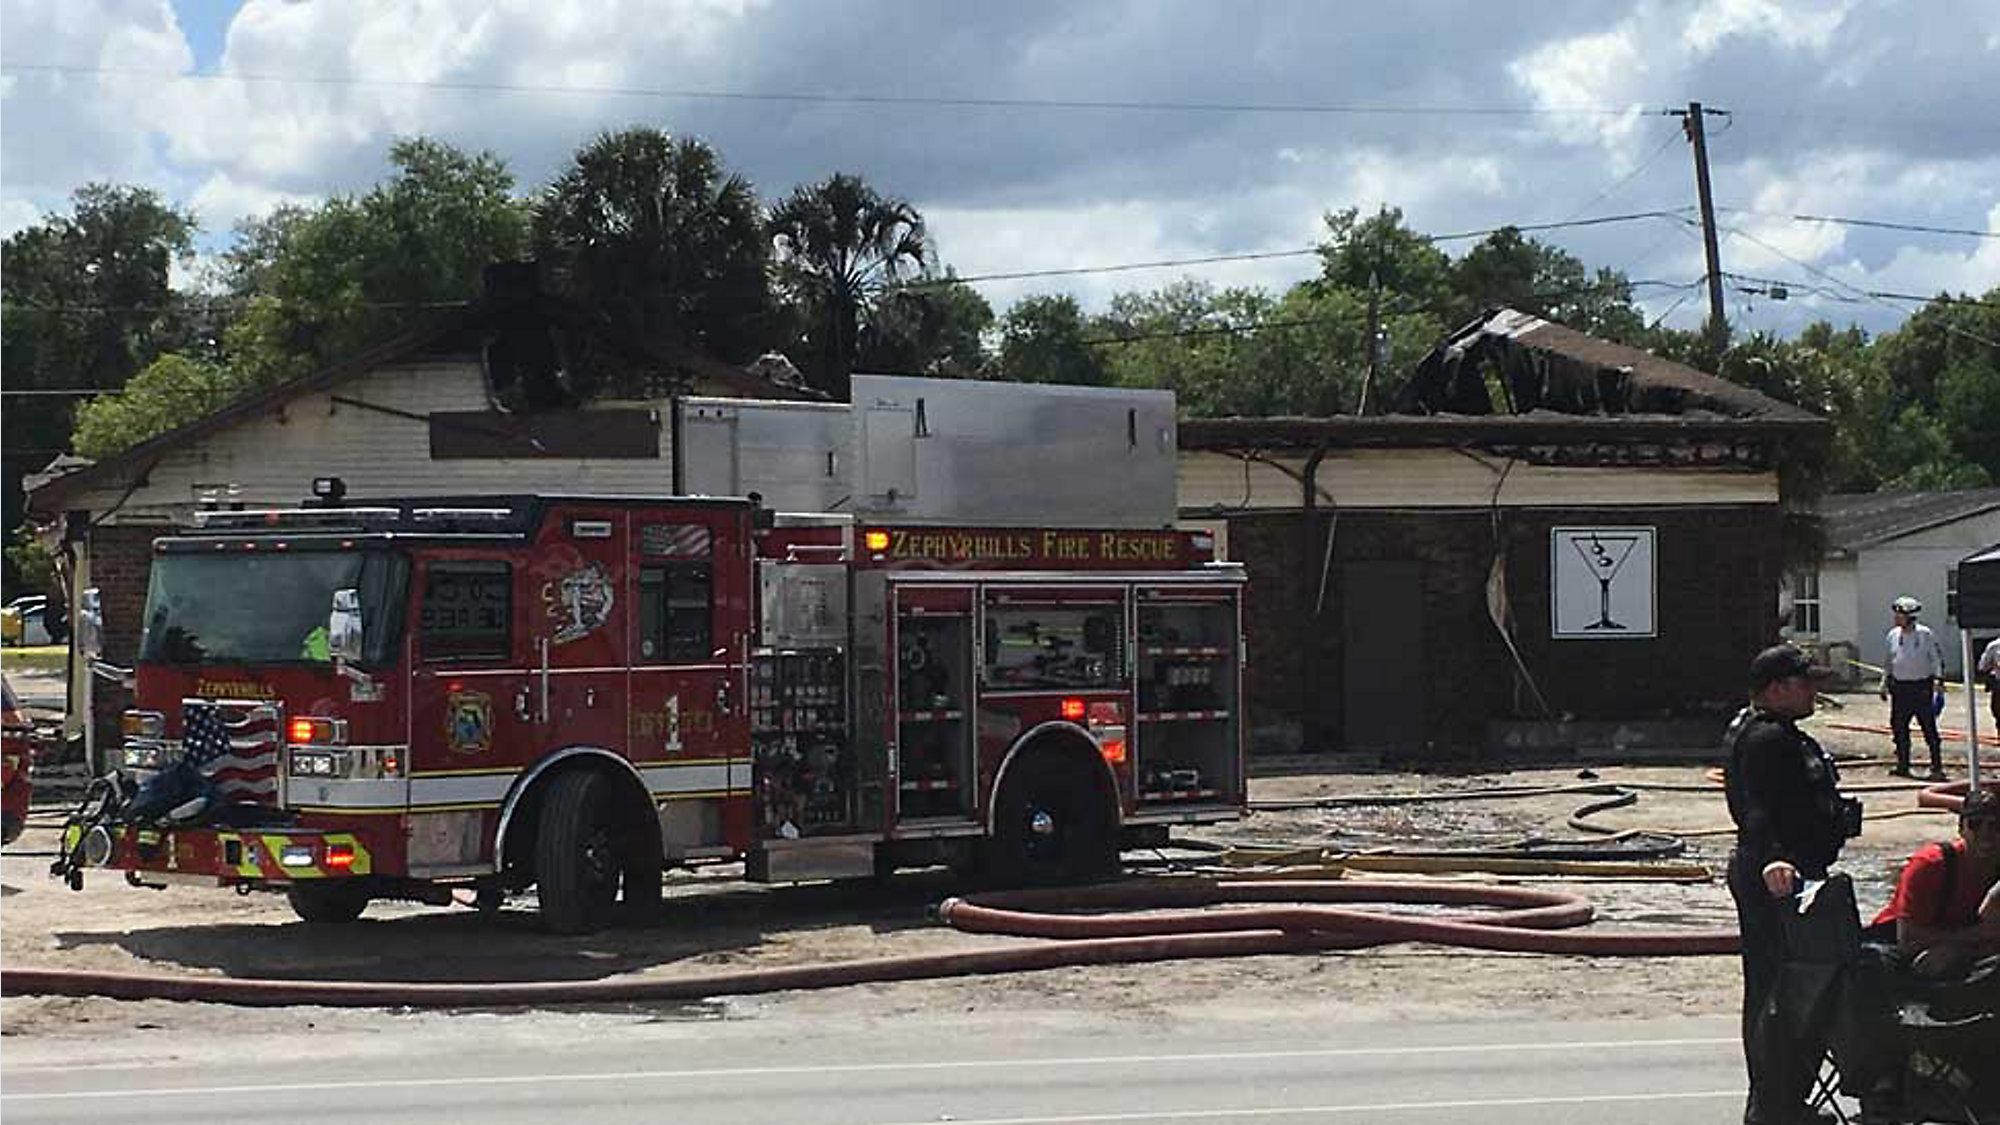 2-Alarm Fire Destroys Zephyrhills Business